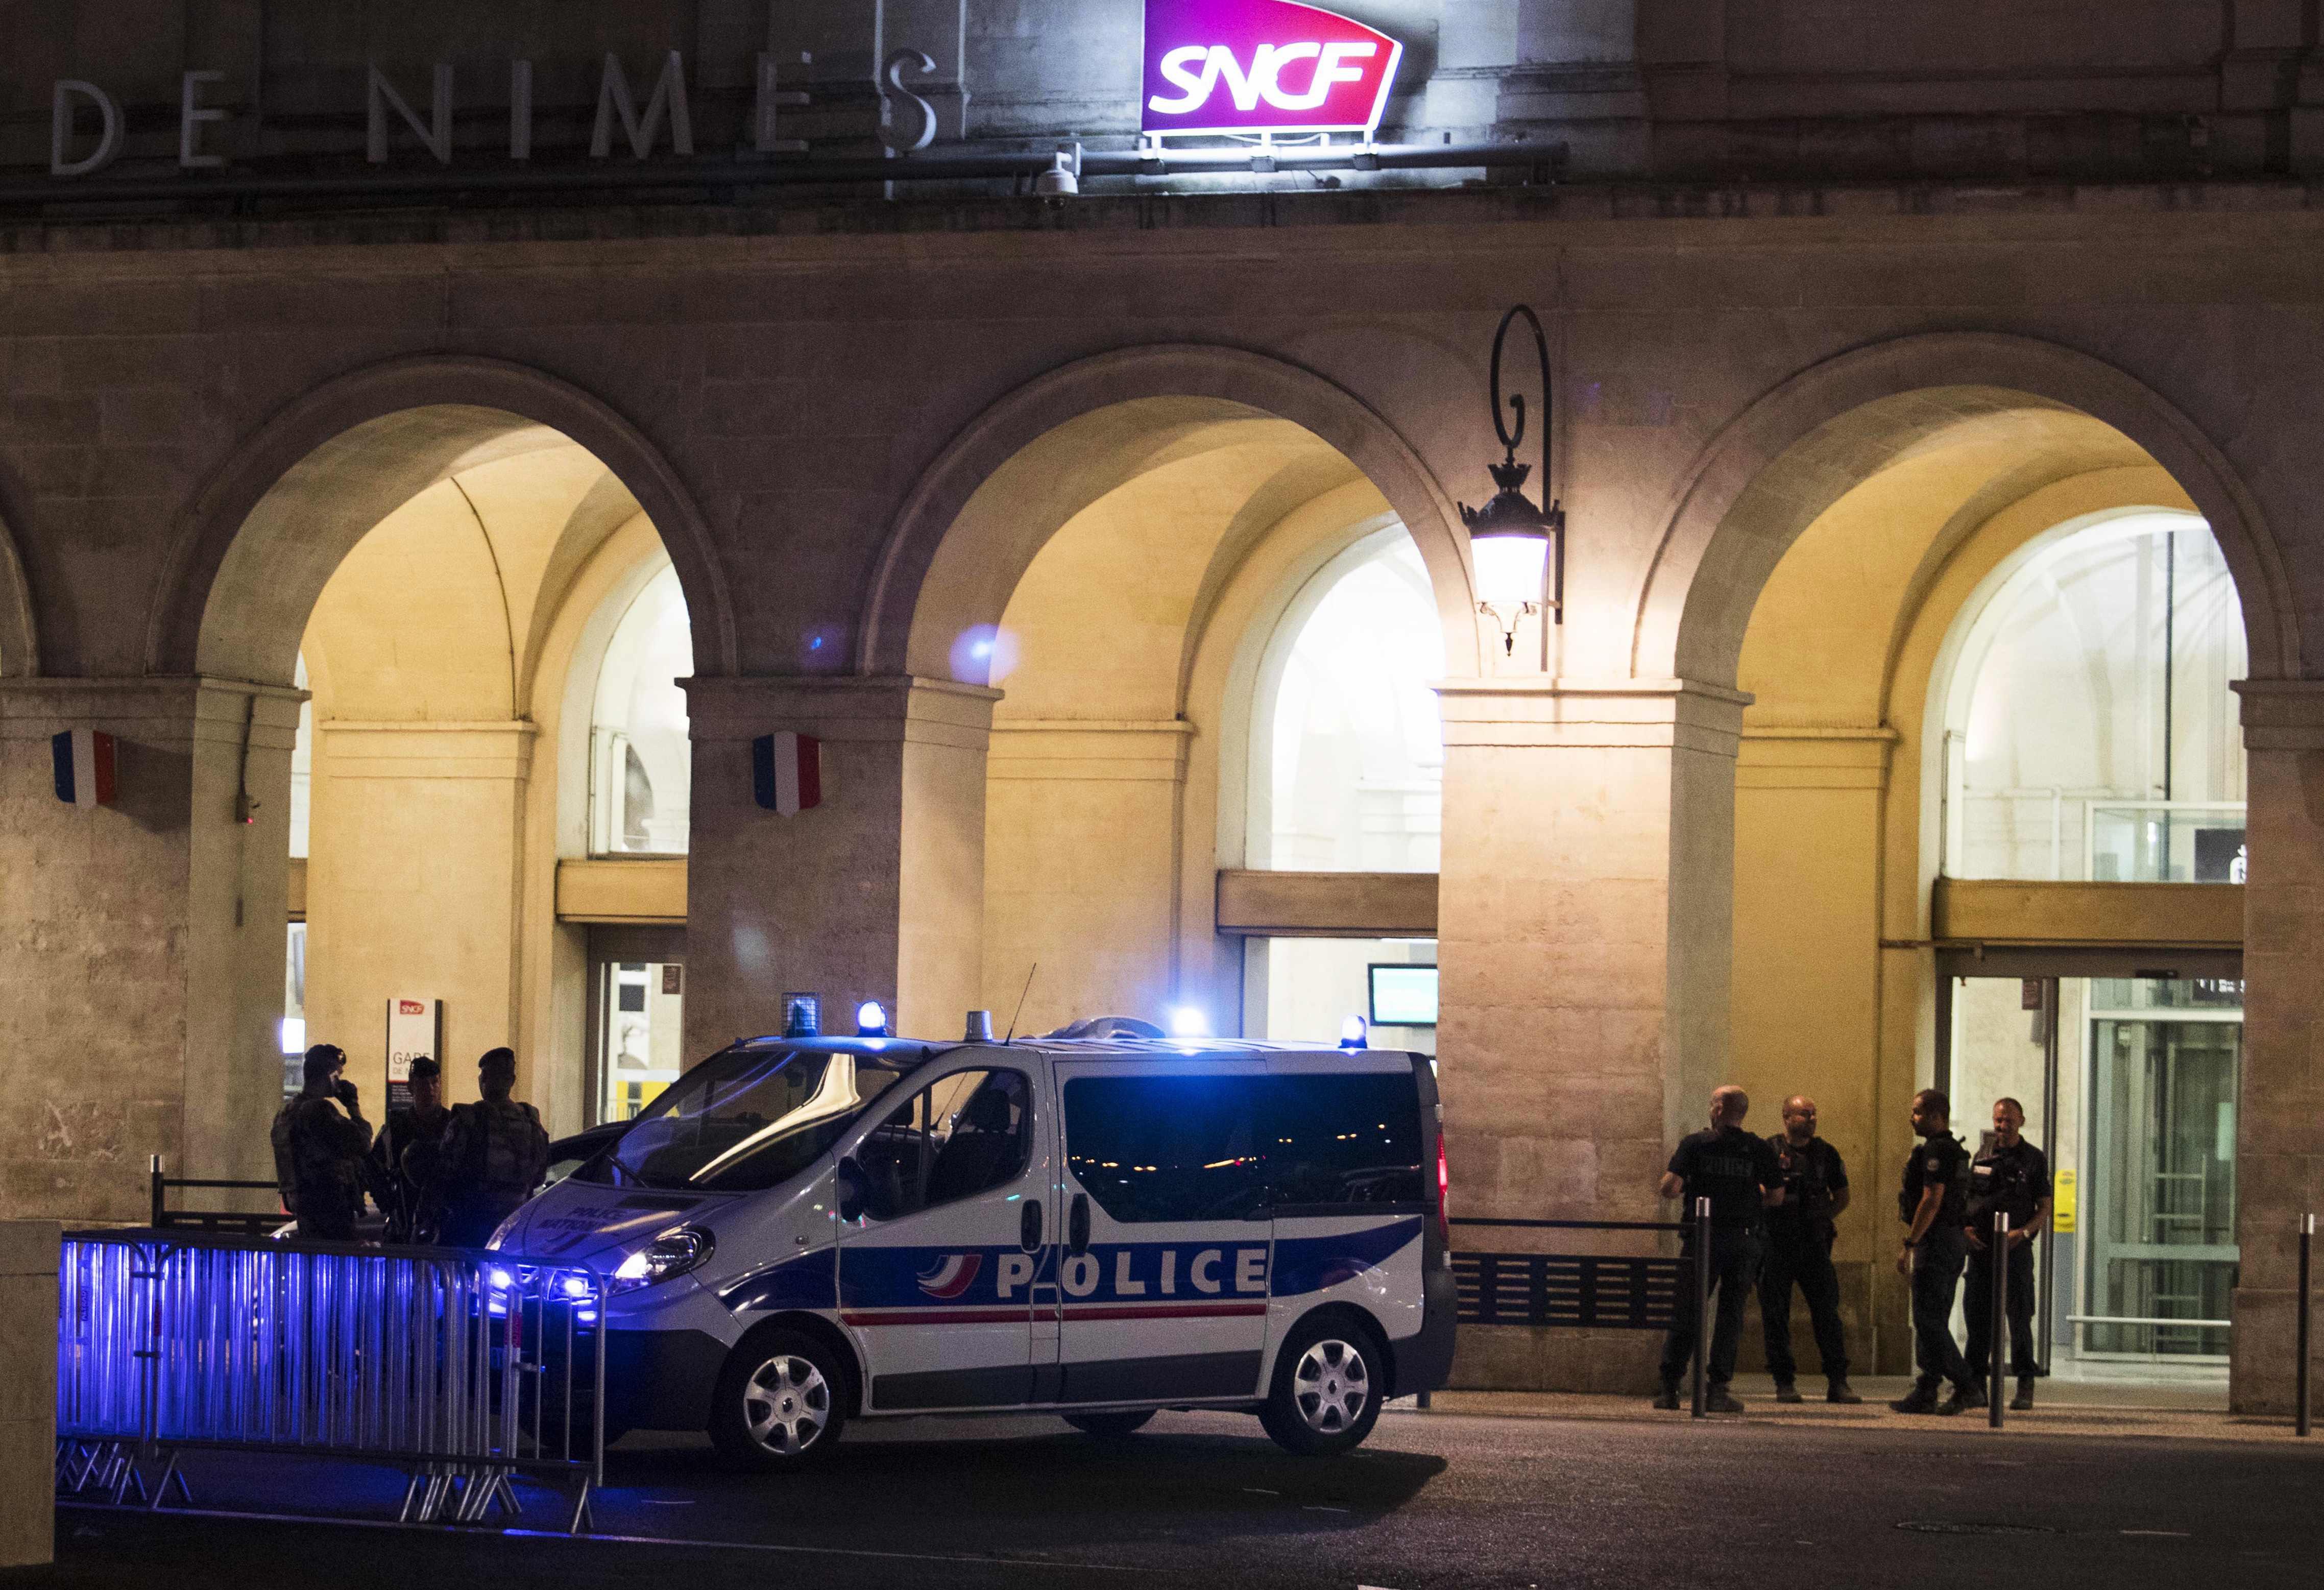 Cyclisme - Vuelta - Vuelta : la gare de Nîmes évacuée en urgence